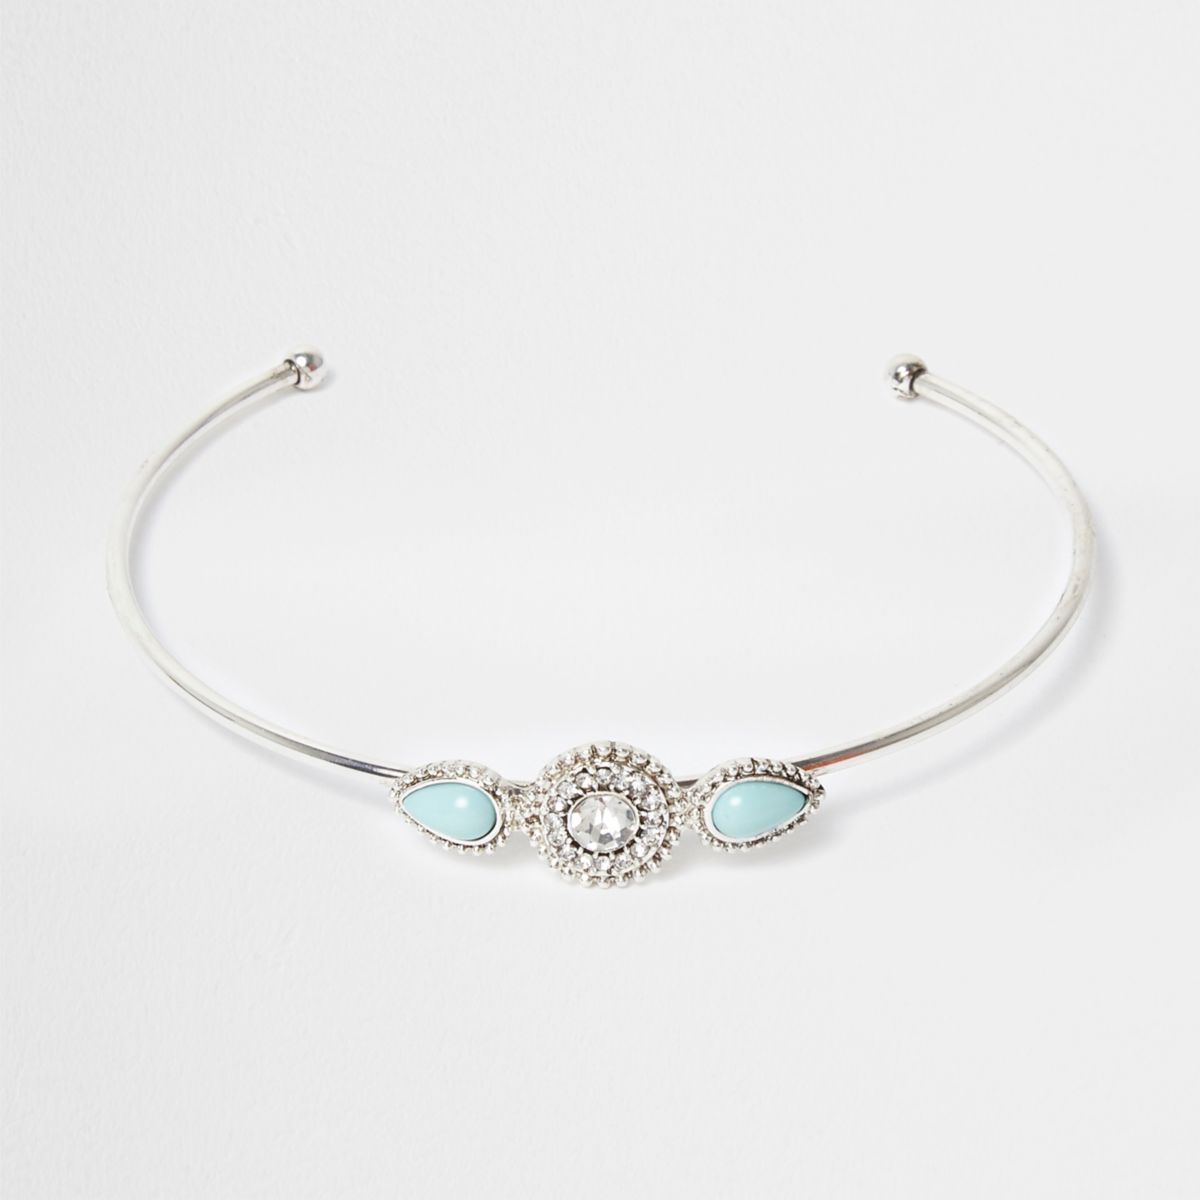 Silver tone turquoise stone arm cuff